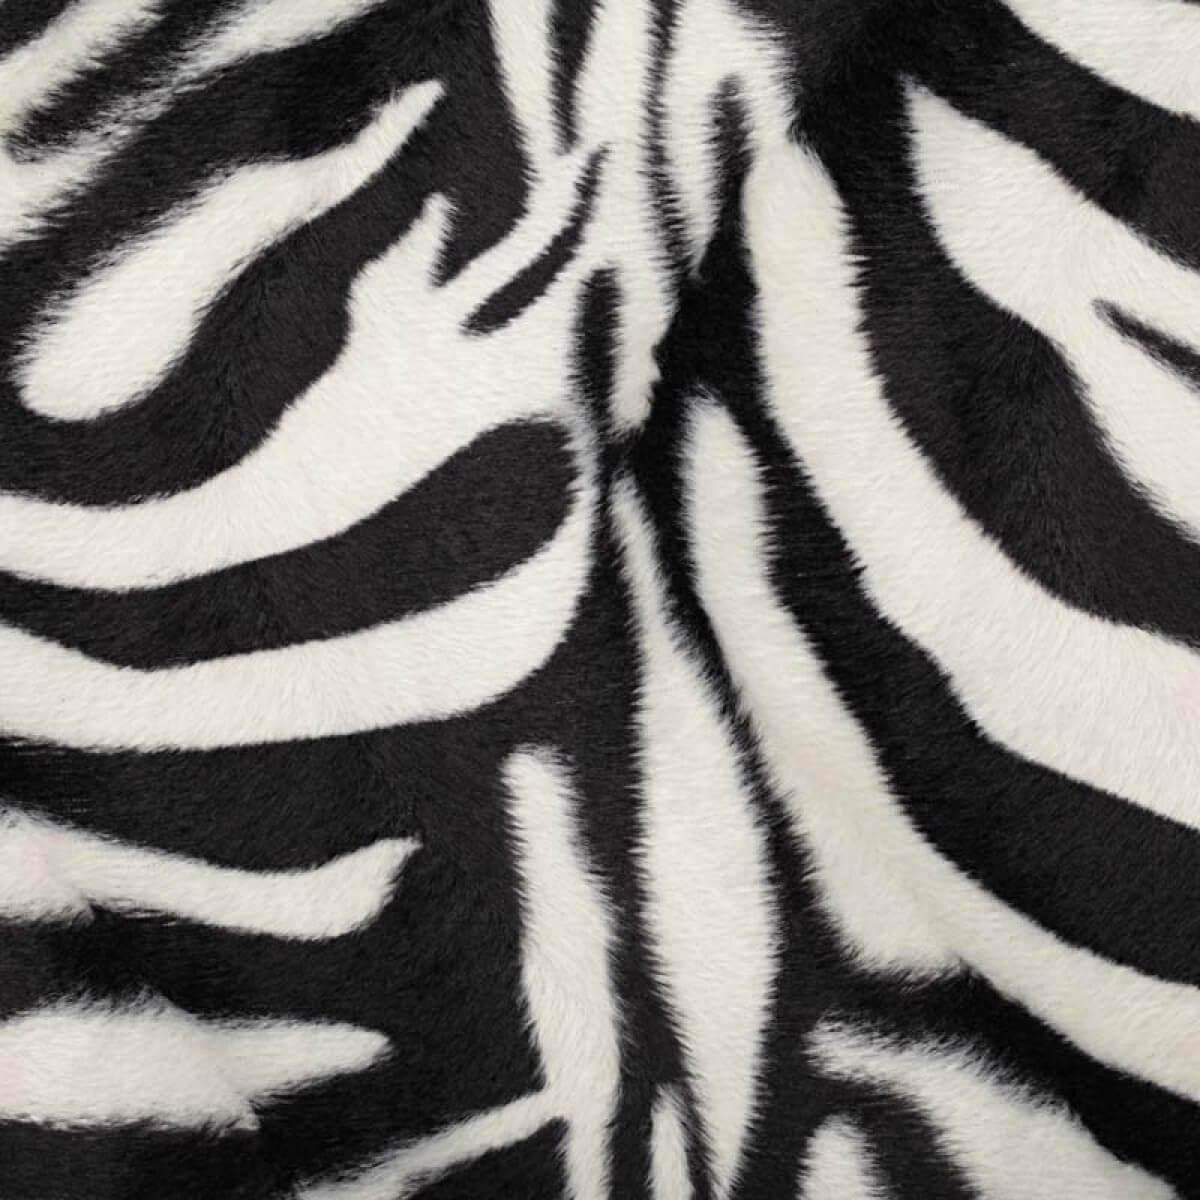 tissu peau de z bre fine fourrure noir blanc mercerie car fil. Black Bedroom Furniture Sets. Home Design Ideas